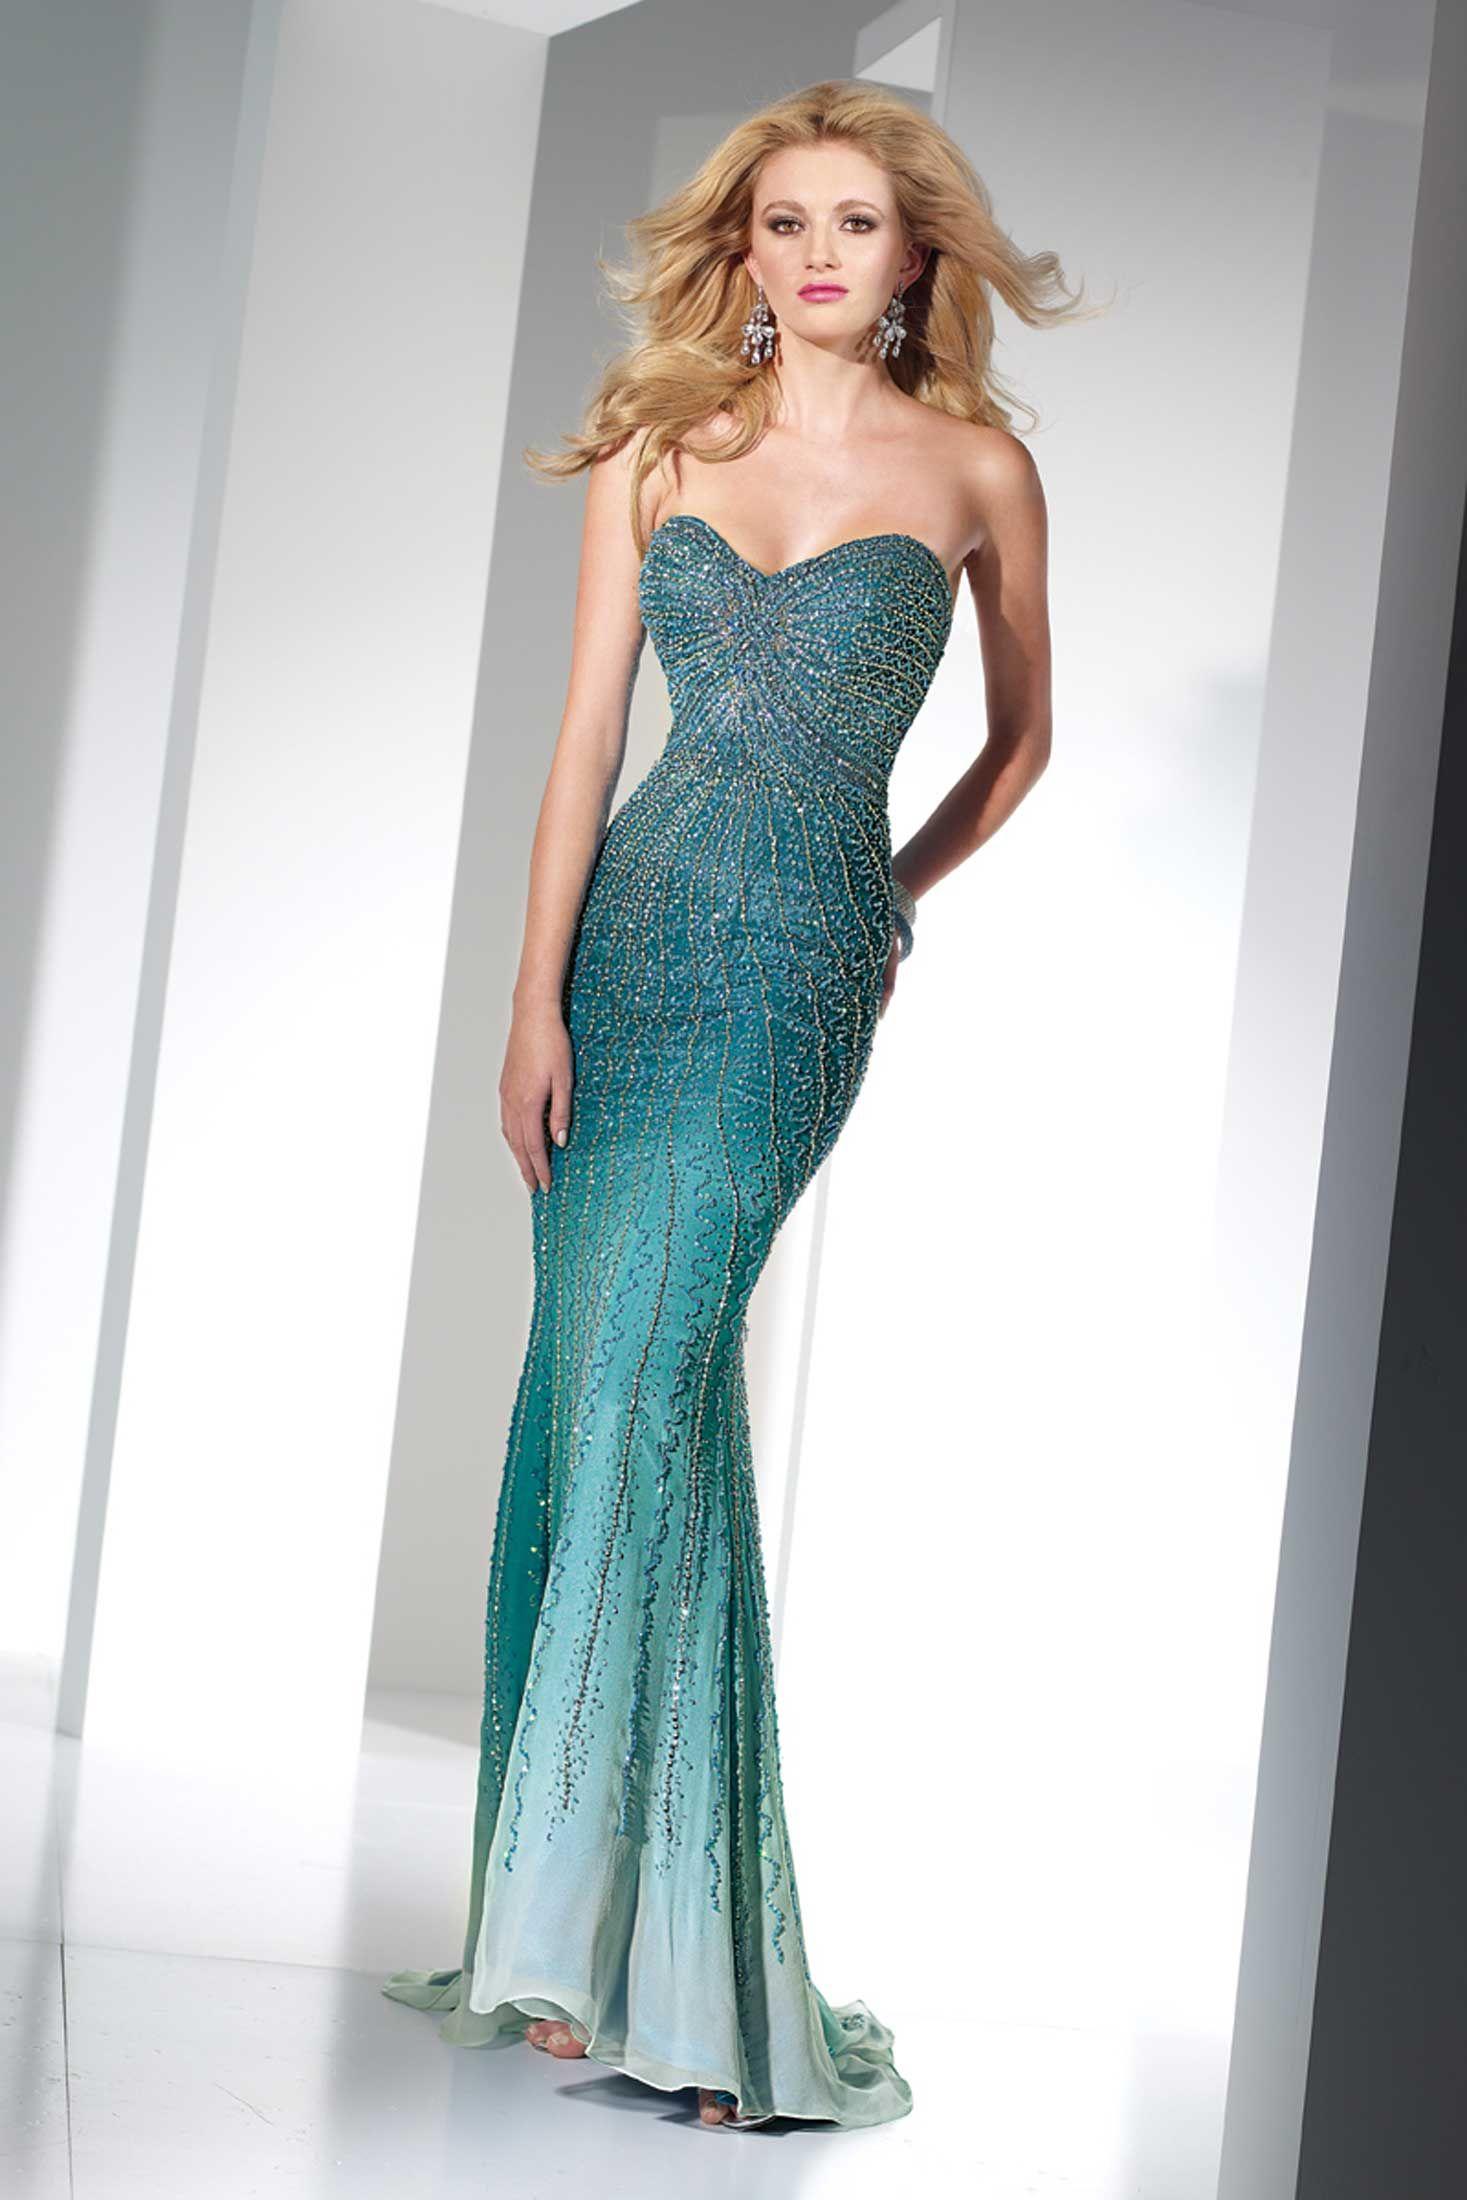 Beaded blue/green dress. Gorgeous. | Interesting enough ...